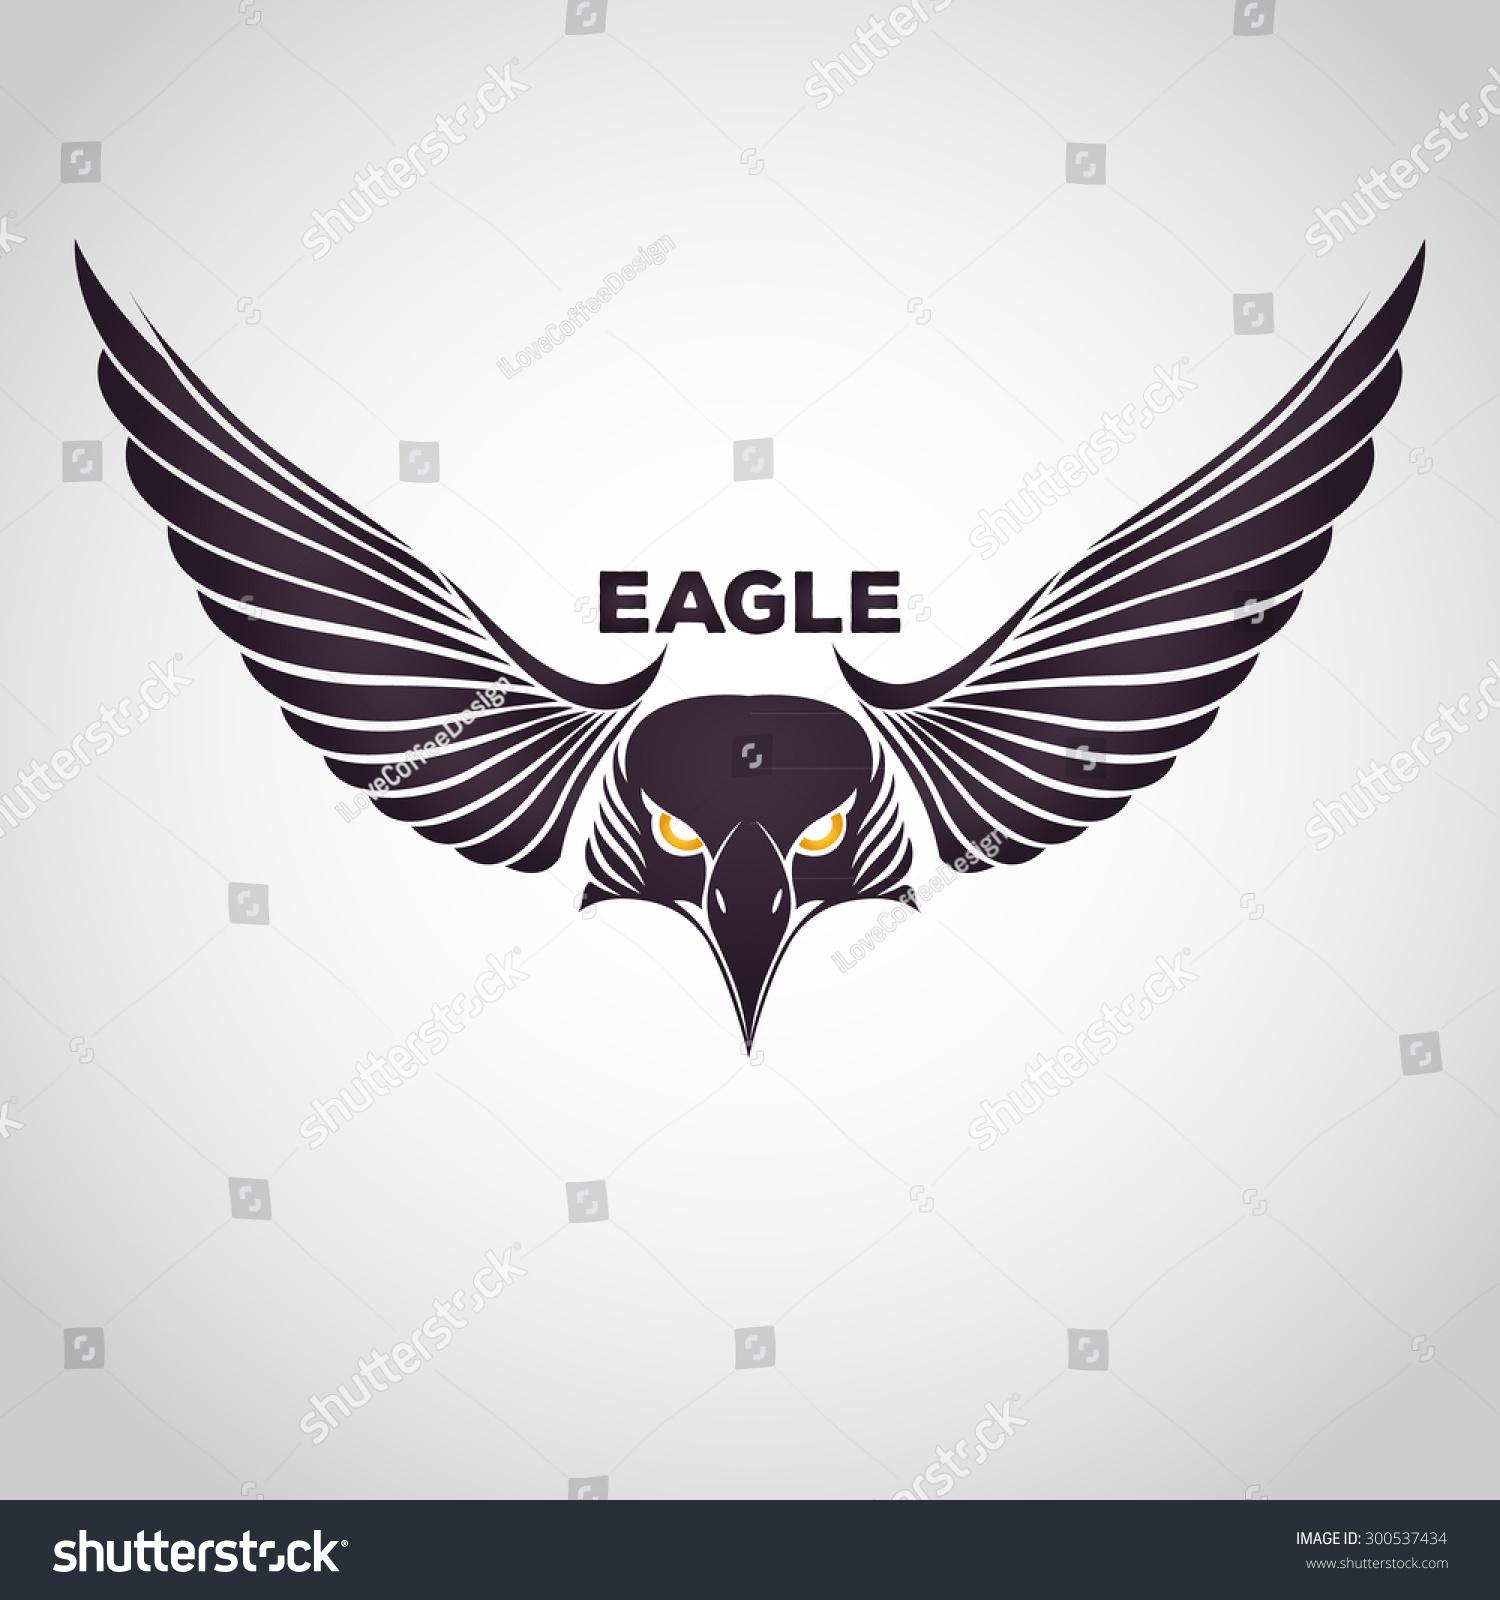 Eagle Logo Stock Vector 300537434 - Shutterstock